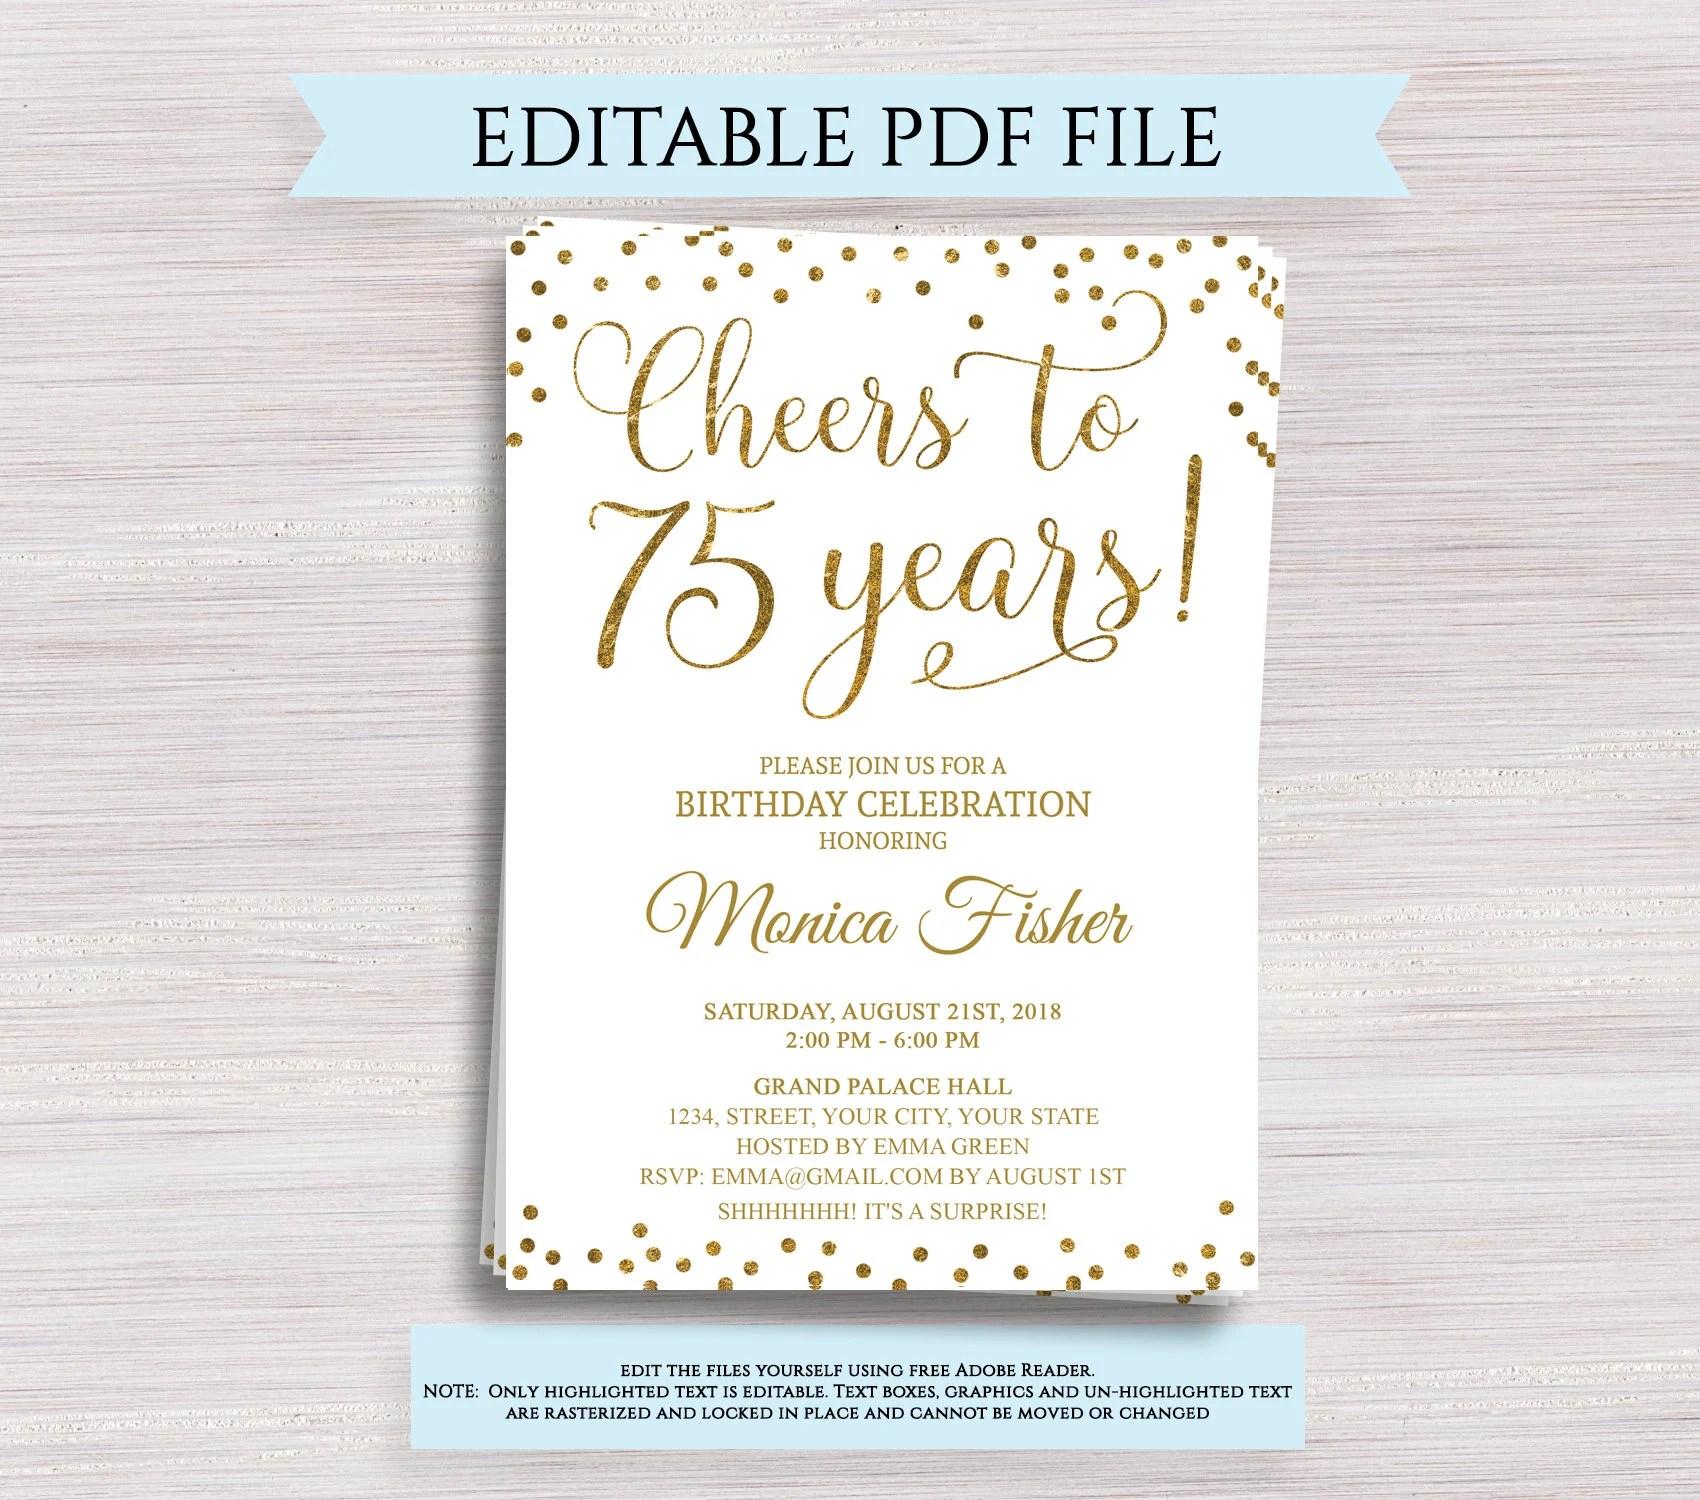 editable 75th birthday party invitation template cheers to 75 years 75th anniversary invitation gold birthday invite digital printable pdf